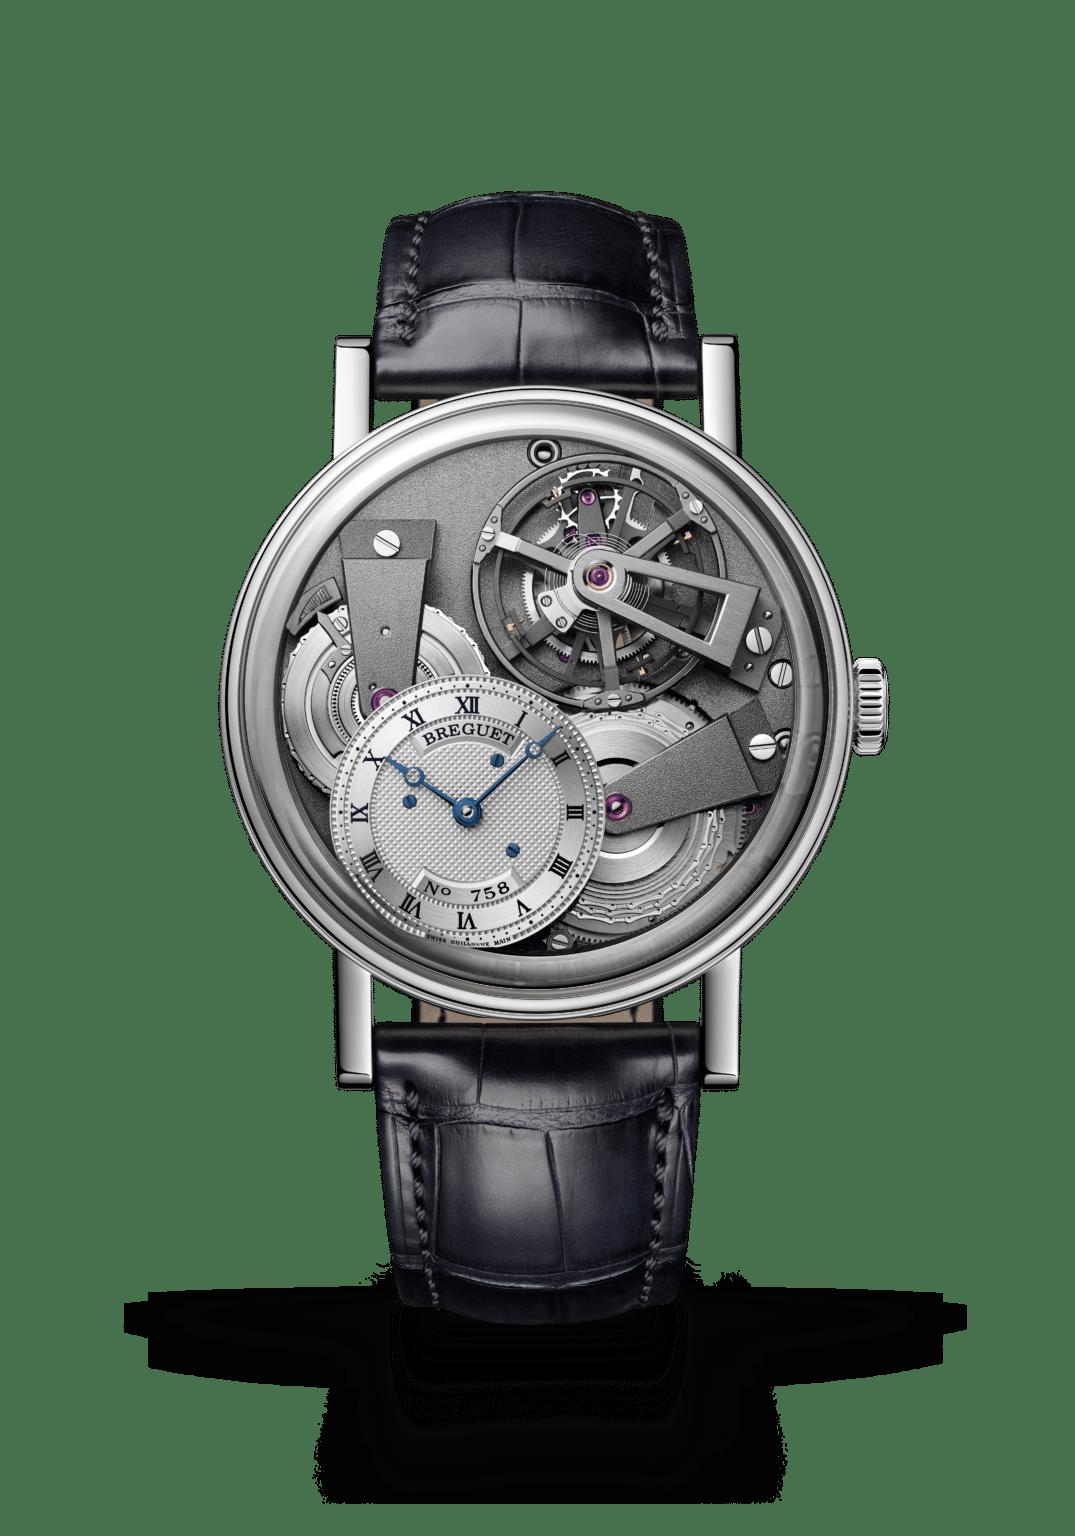 Breguet – Tradition – Tradition Tourbillon - Wagner Bijouterie Uhren